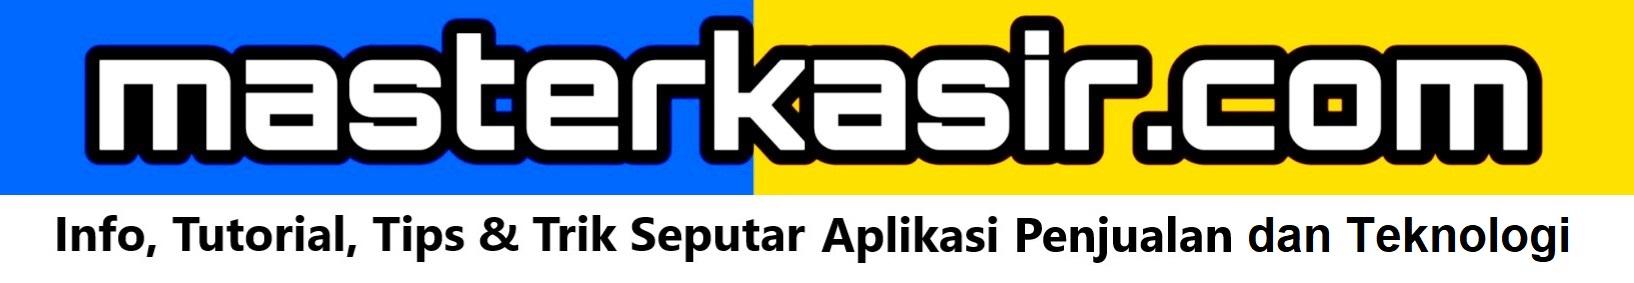 masterkasir.com